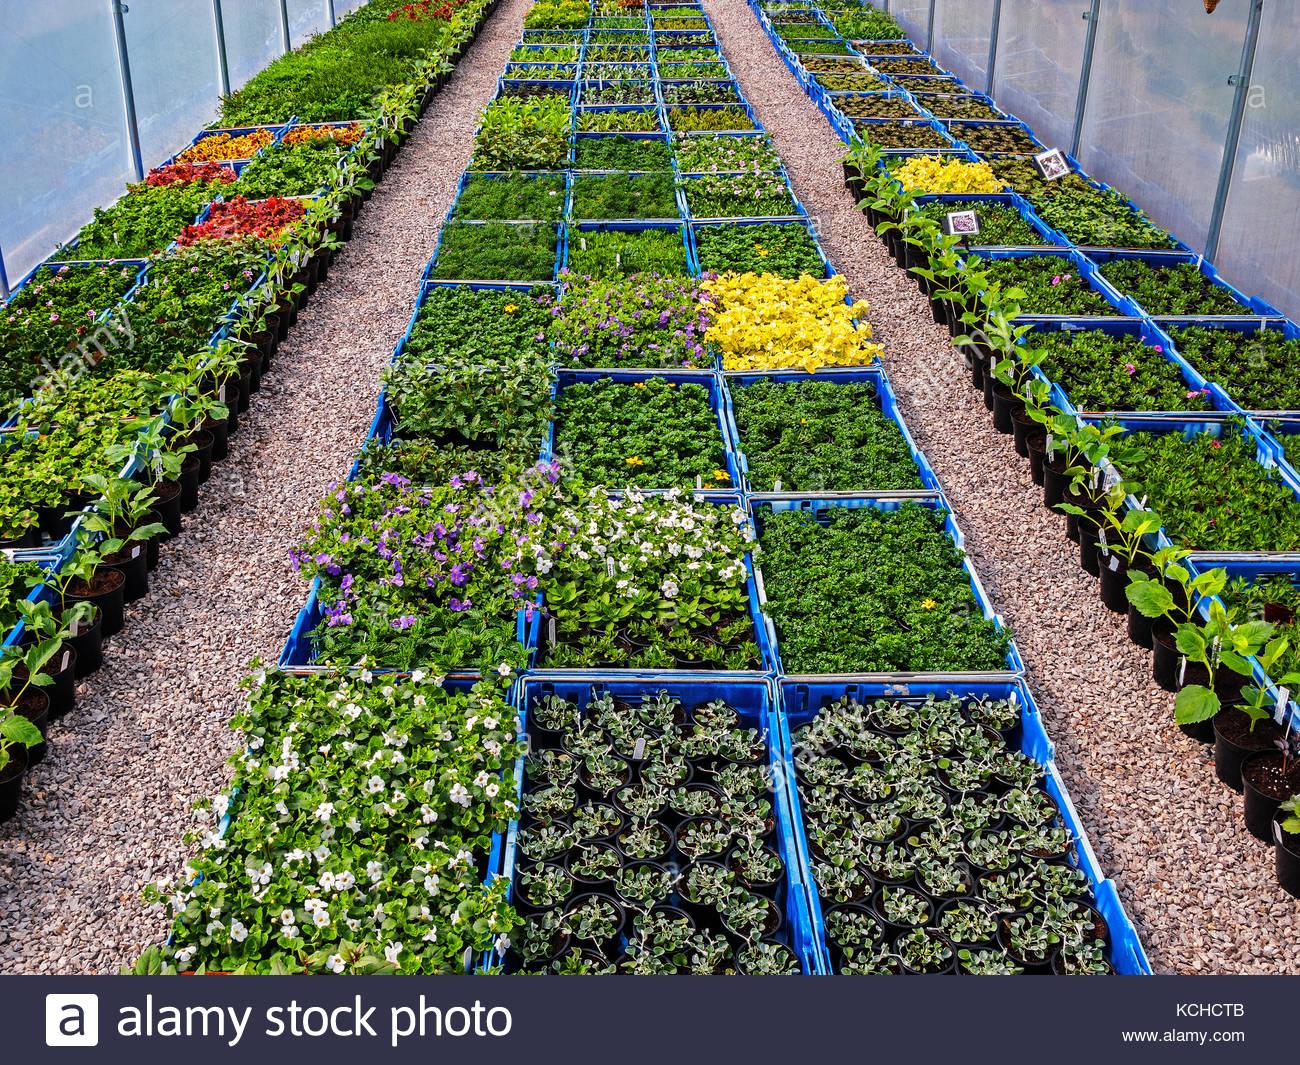 Independent Nursery & Landscape Design Contractor